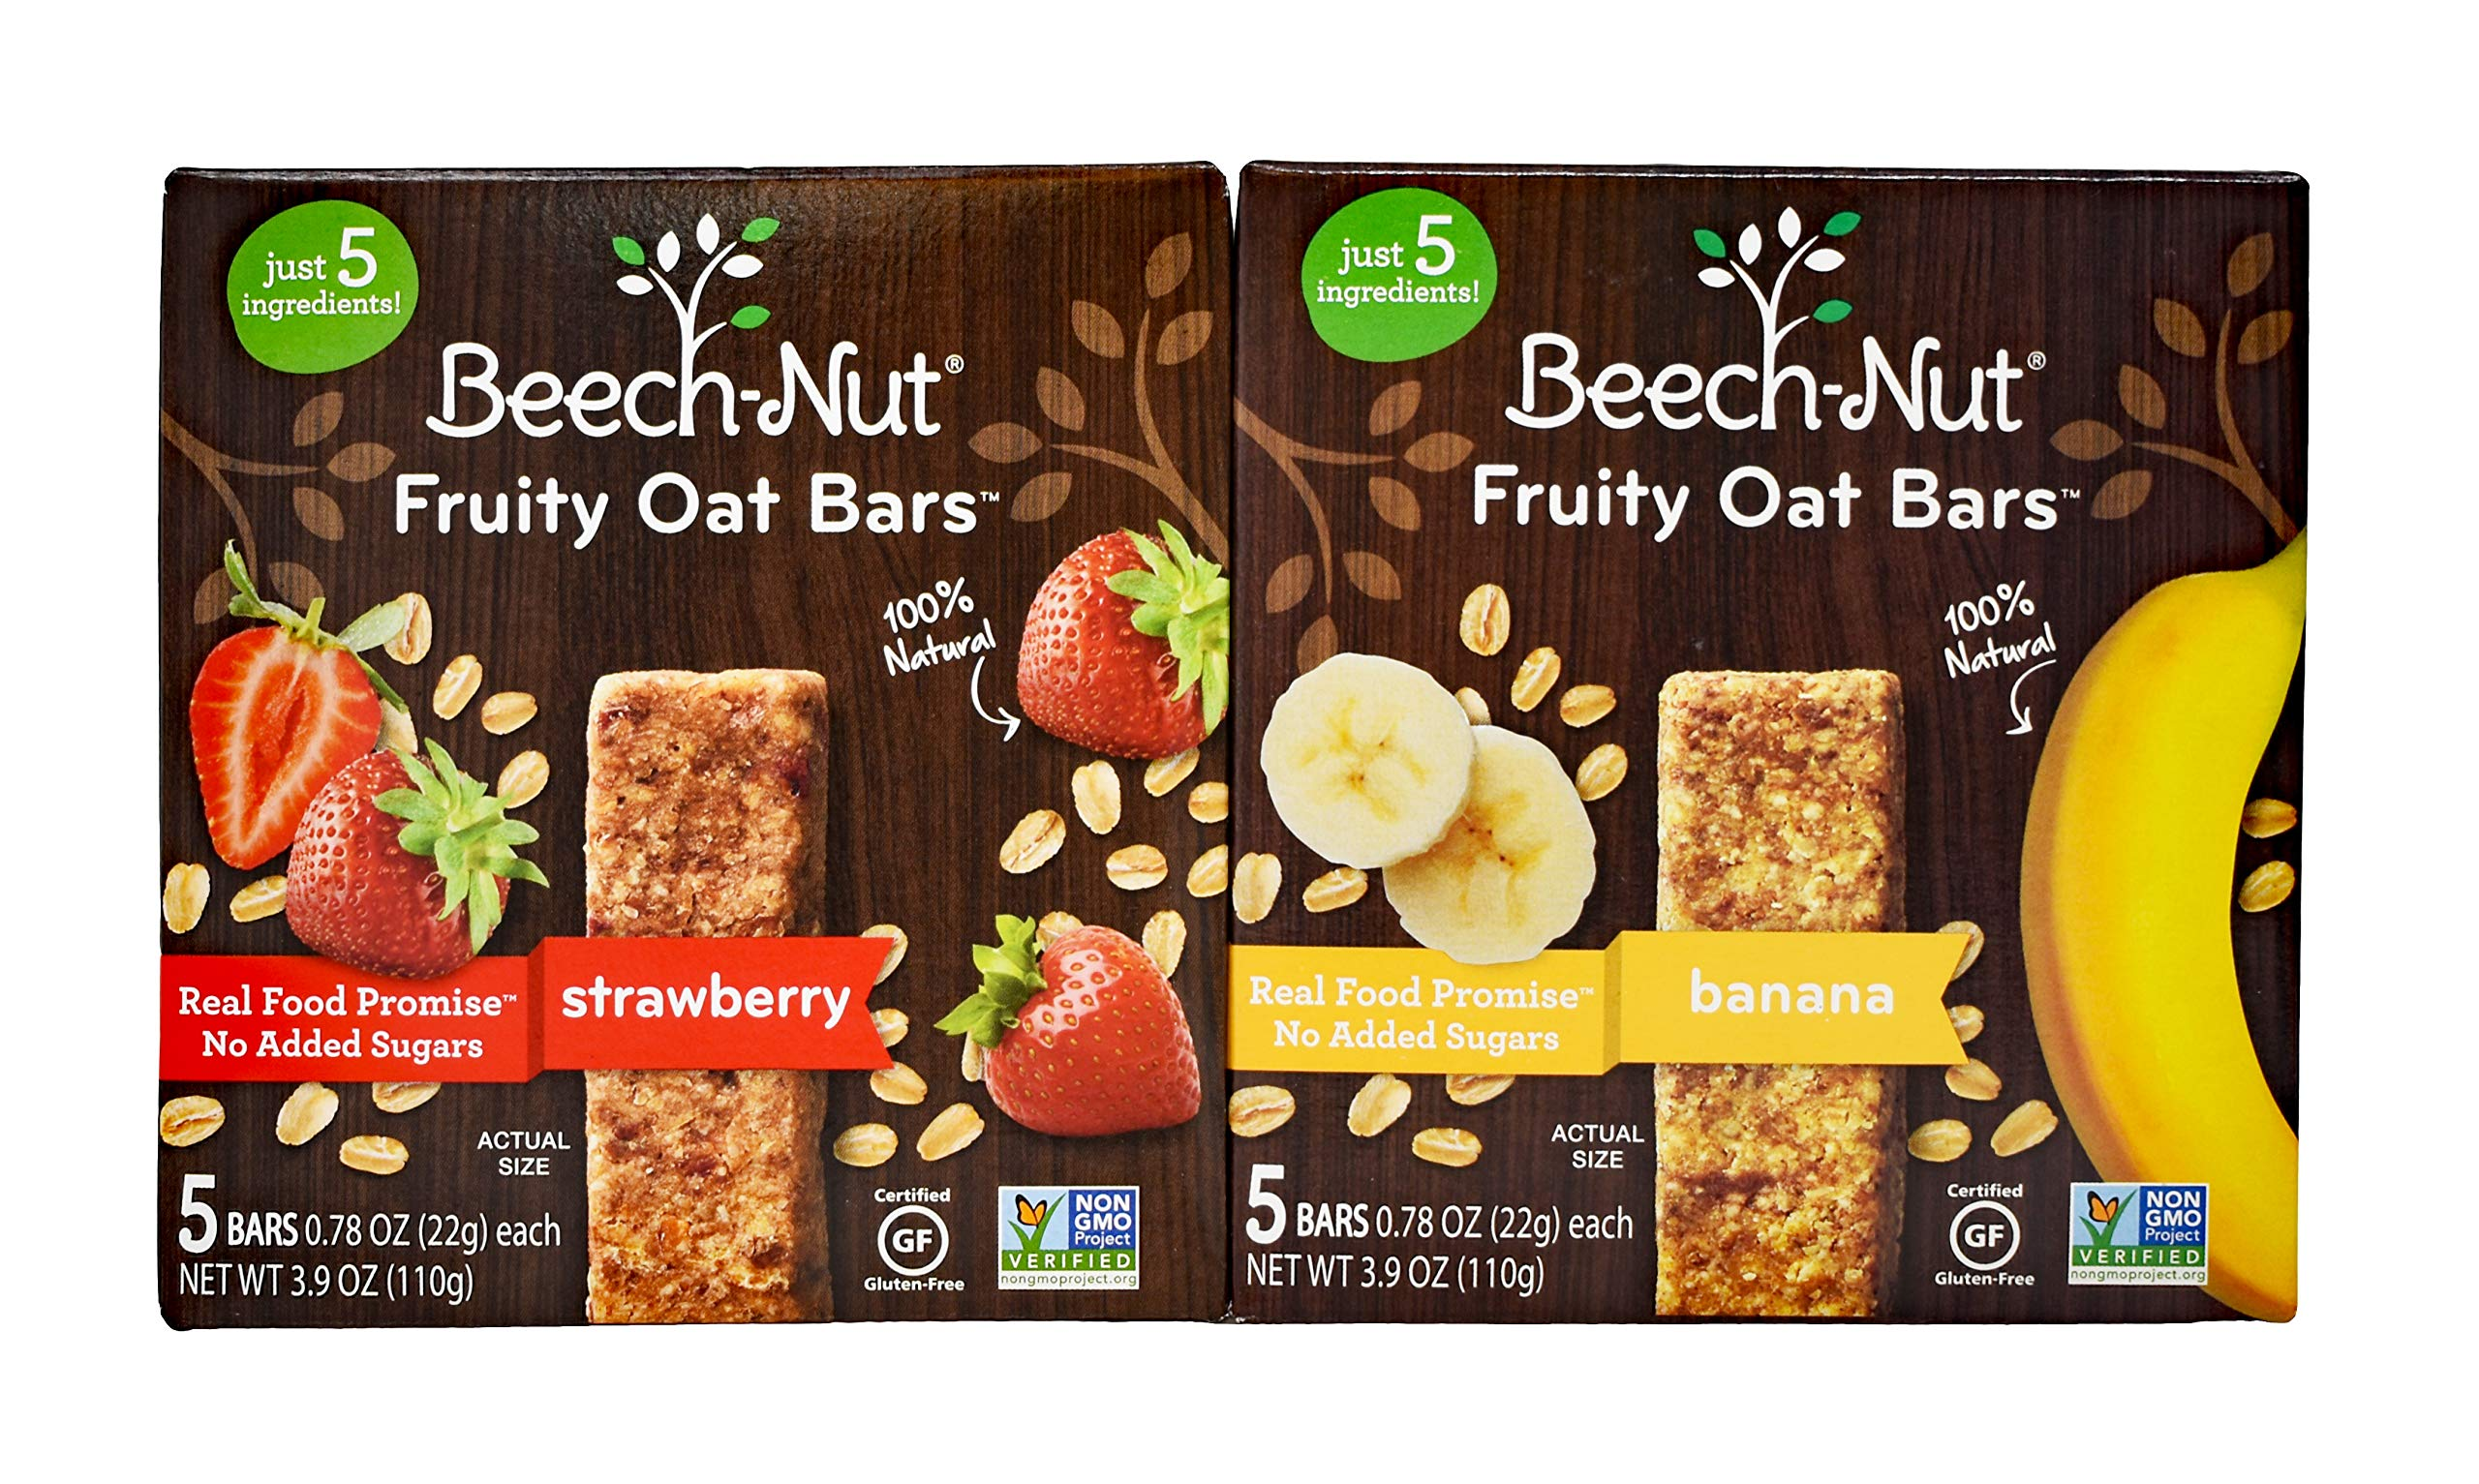 Beech-Nut Fruity Oat Bars 2 Packs. 1 Box Strawberry and 1 Box Banana 5 Bars in each Box. by Beech-Nut